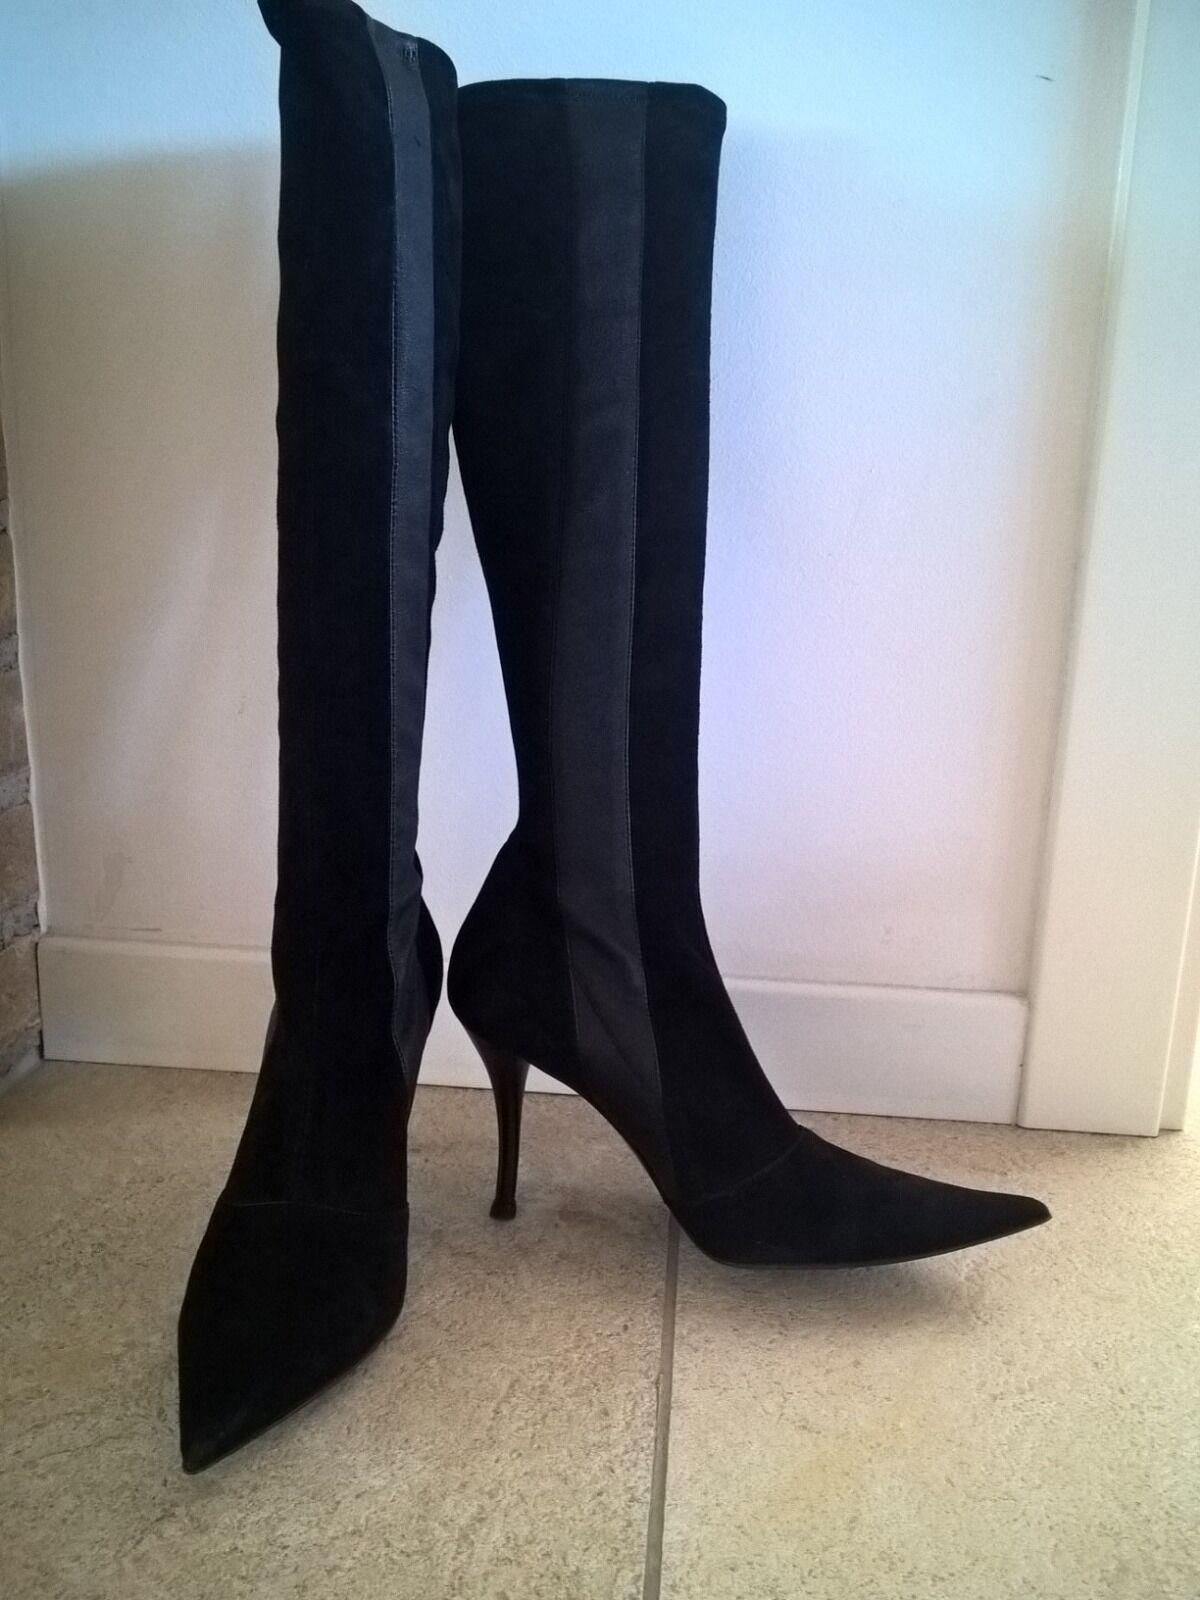 Zapatos especiales con descuento stivali pelle scamosciata neri, 39, les tropeziennes